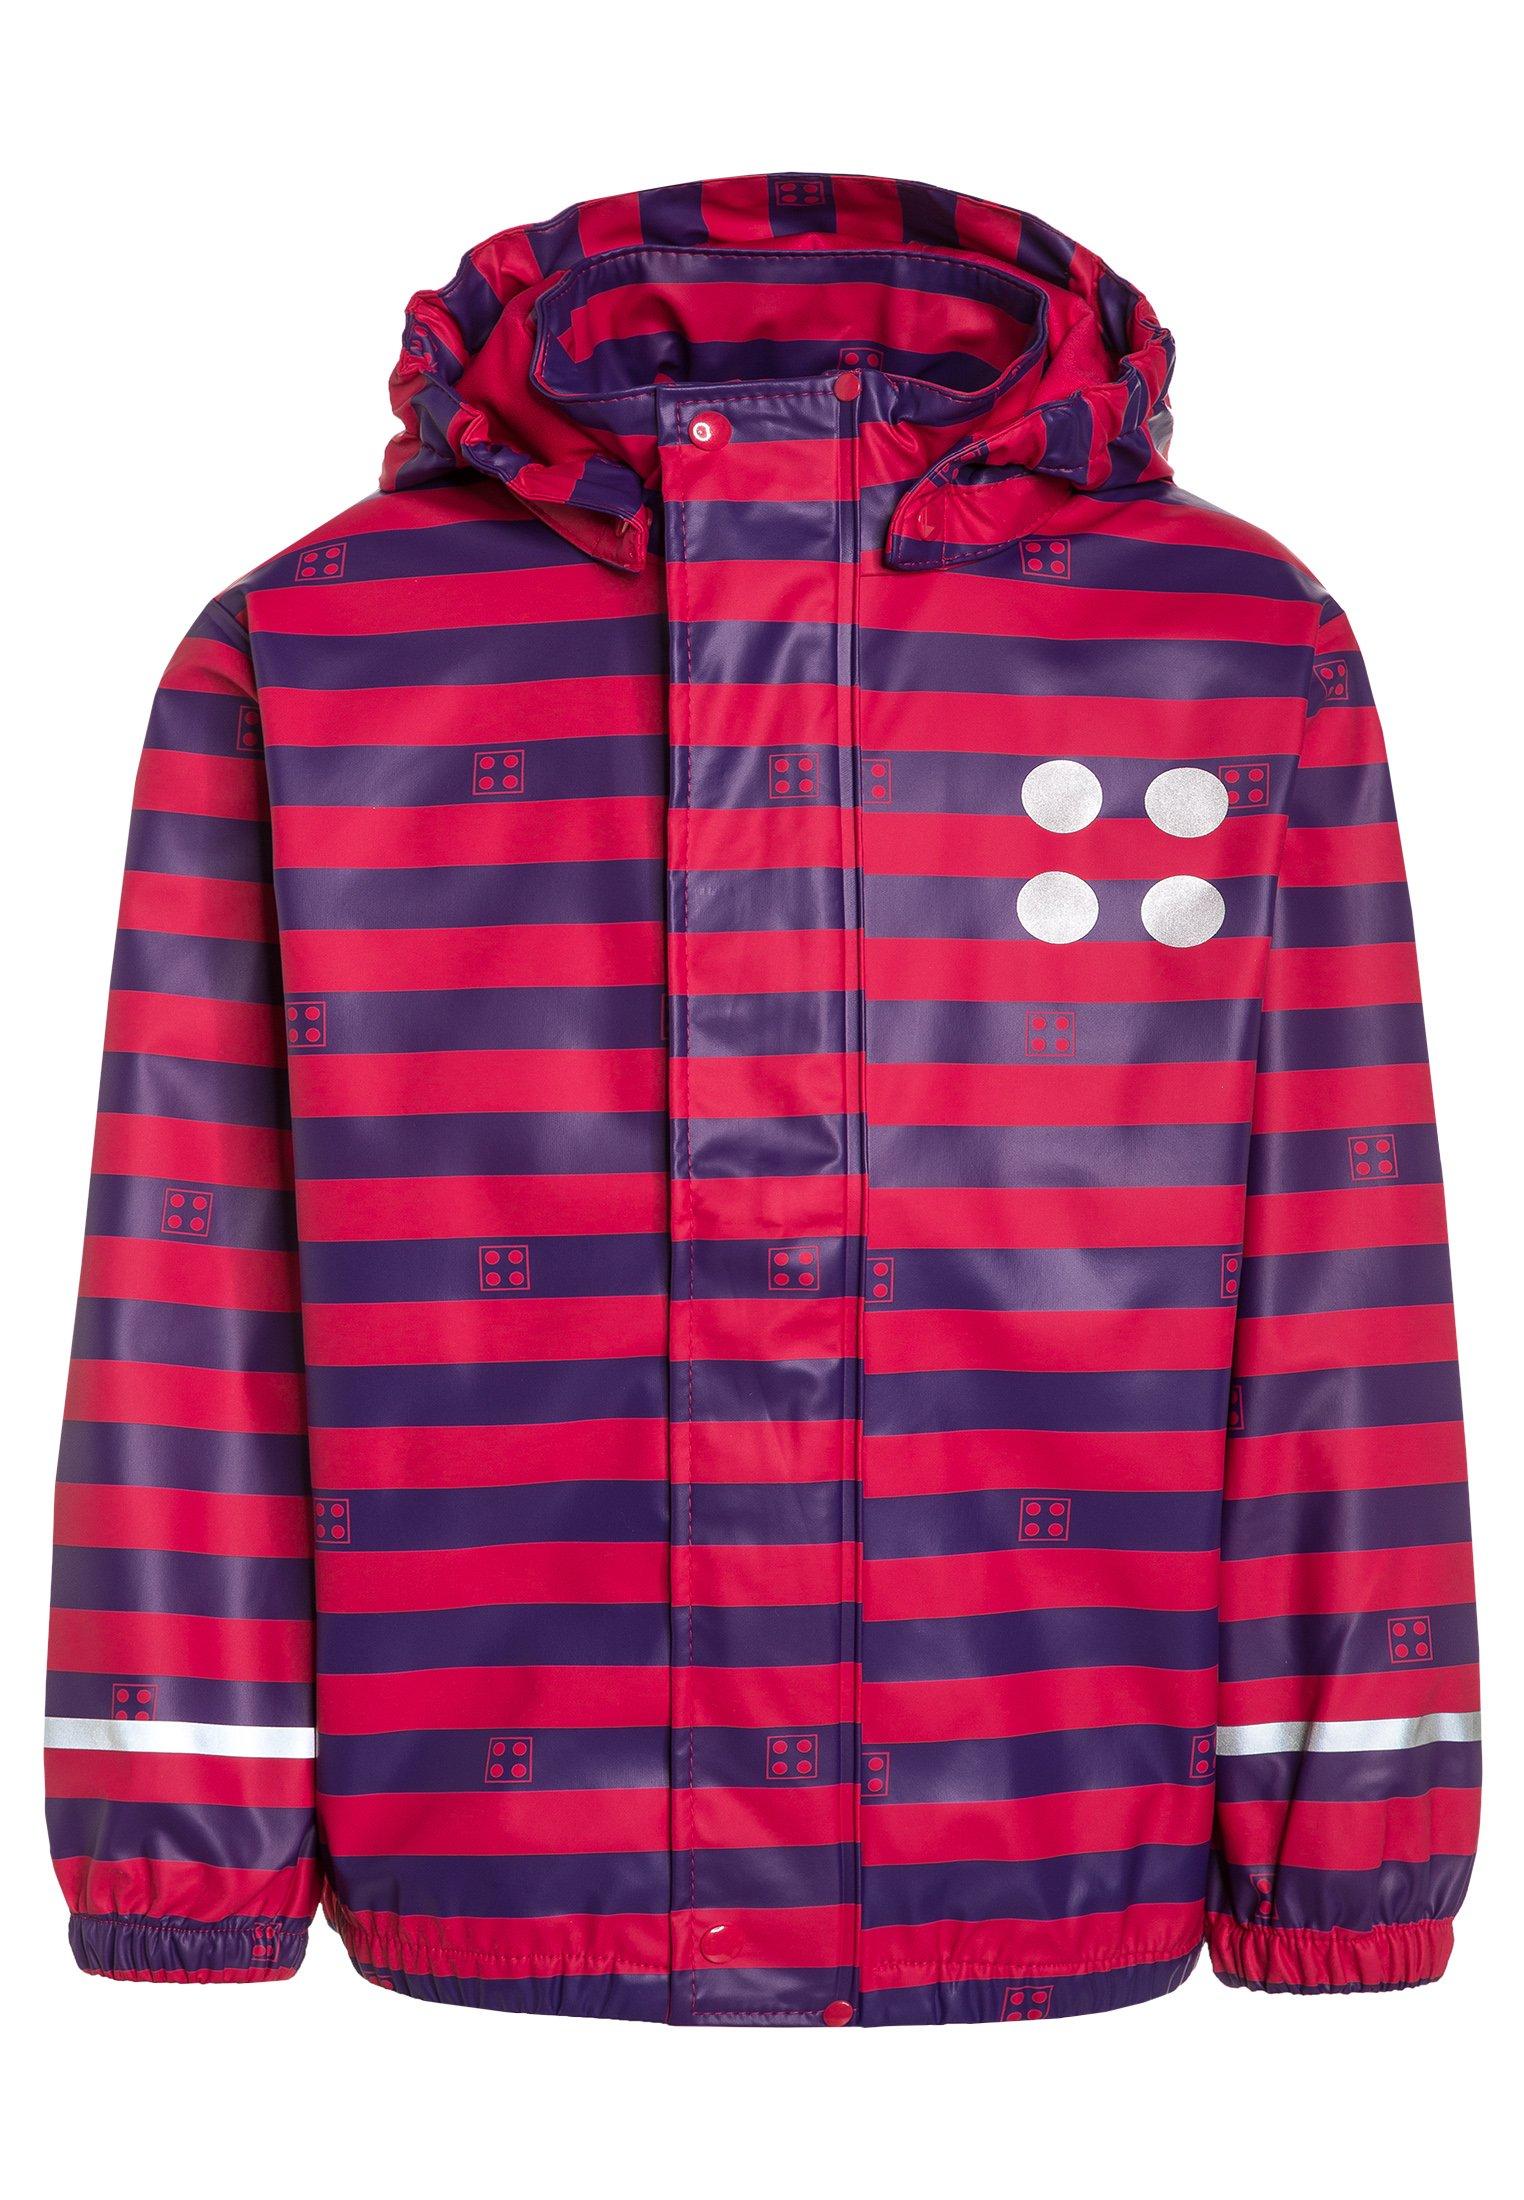 Kinder JAMAICA - Regenjacke / wasserabweisende Jacke